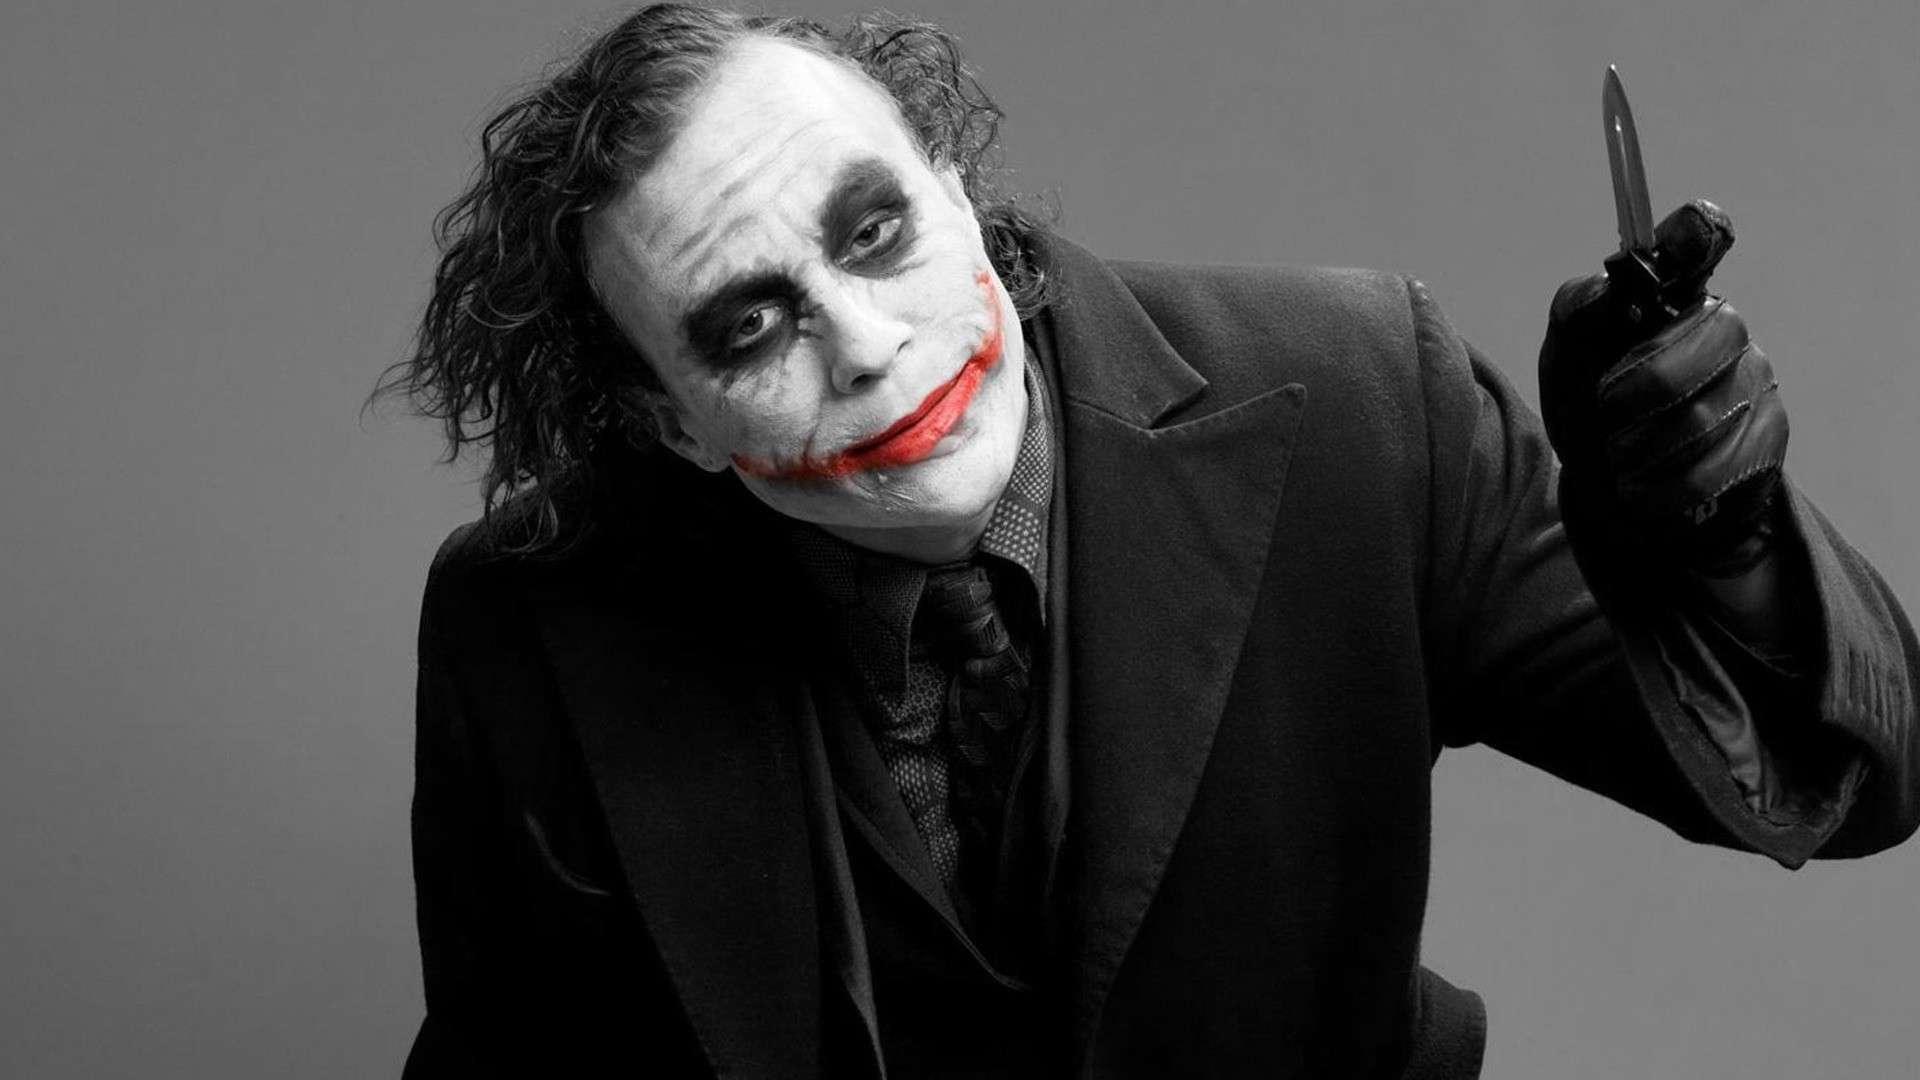 Joker Heath Ledger DC comics black and red batman photograph